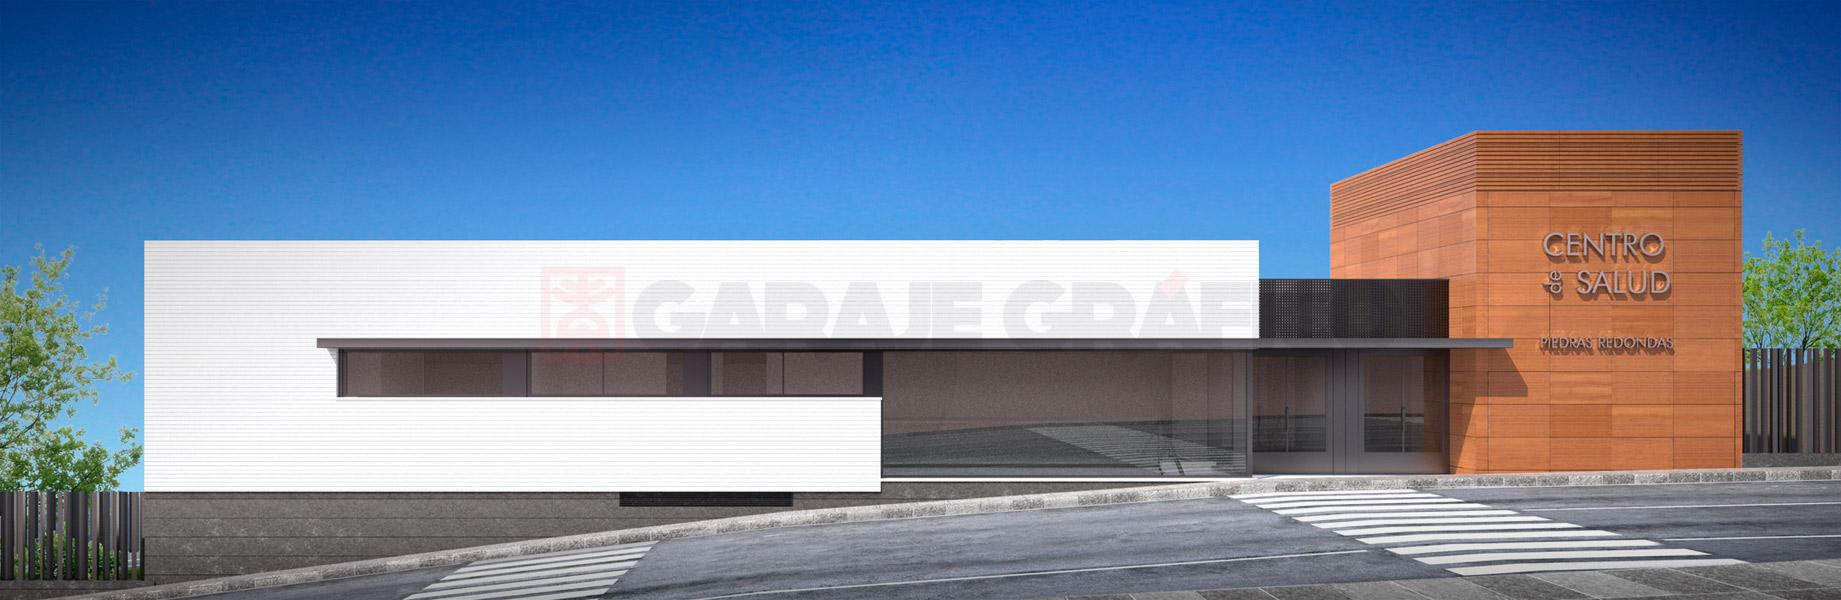 exteriores 3d concurso de arquitectura